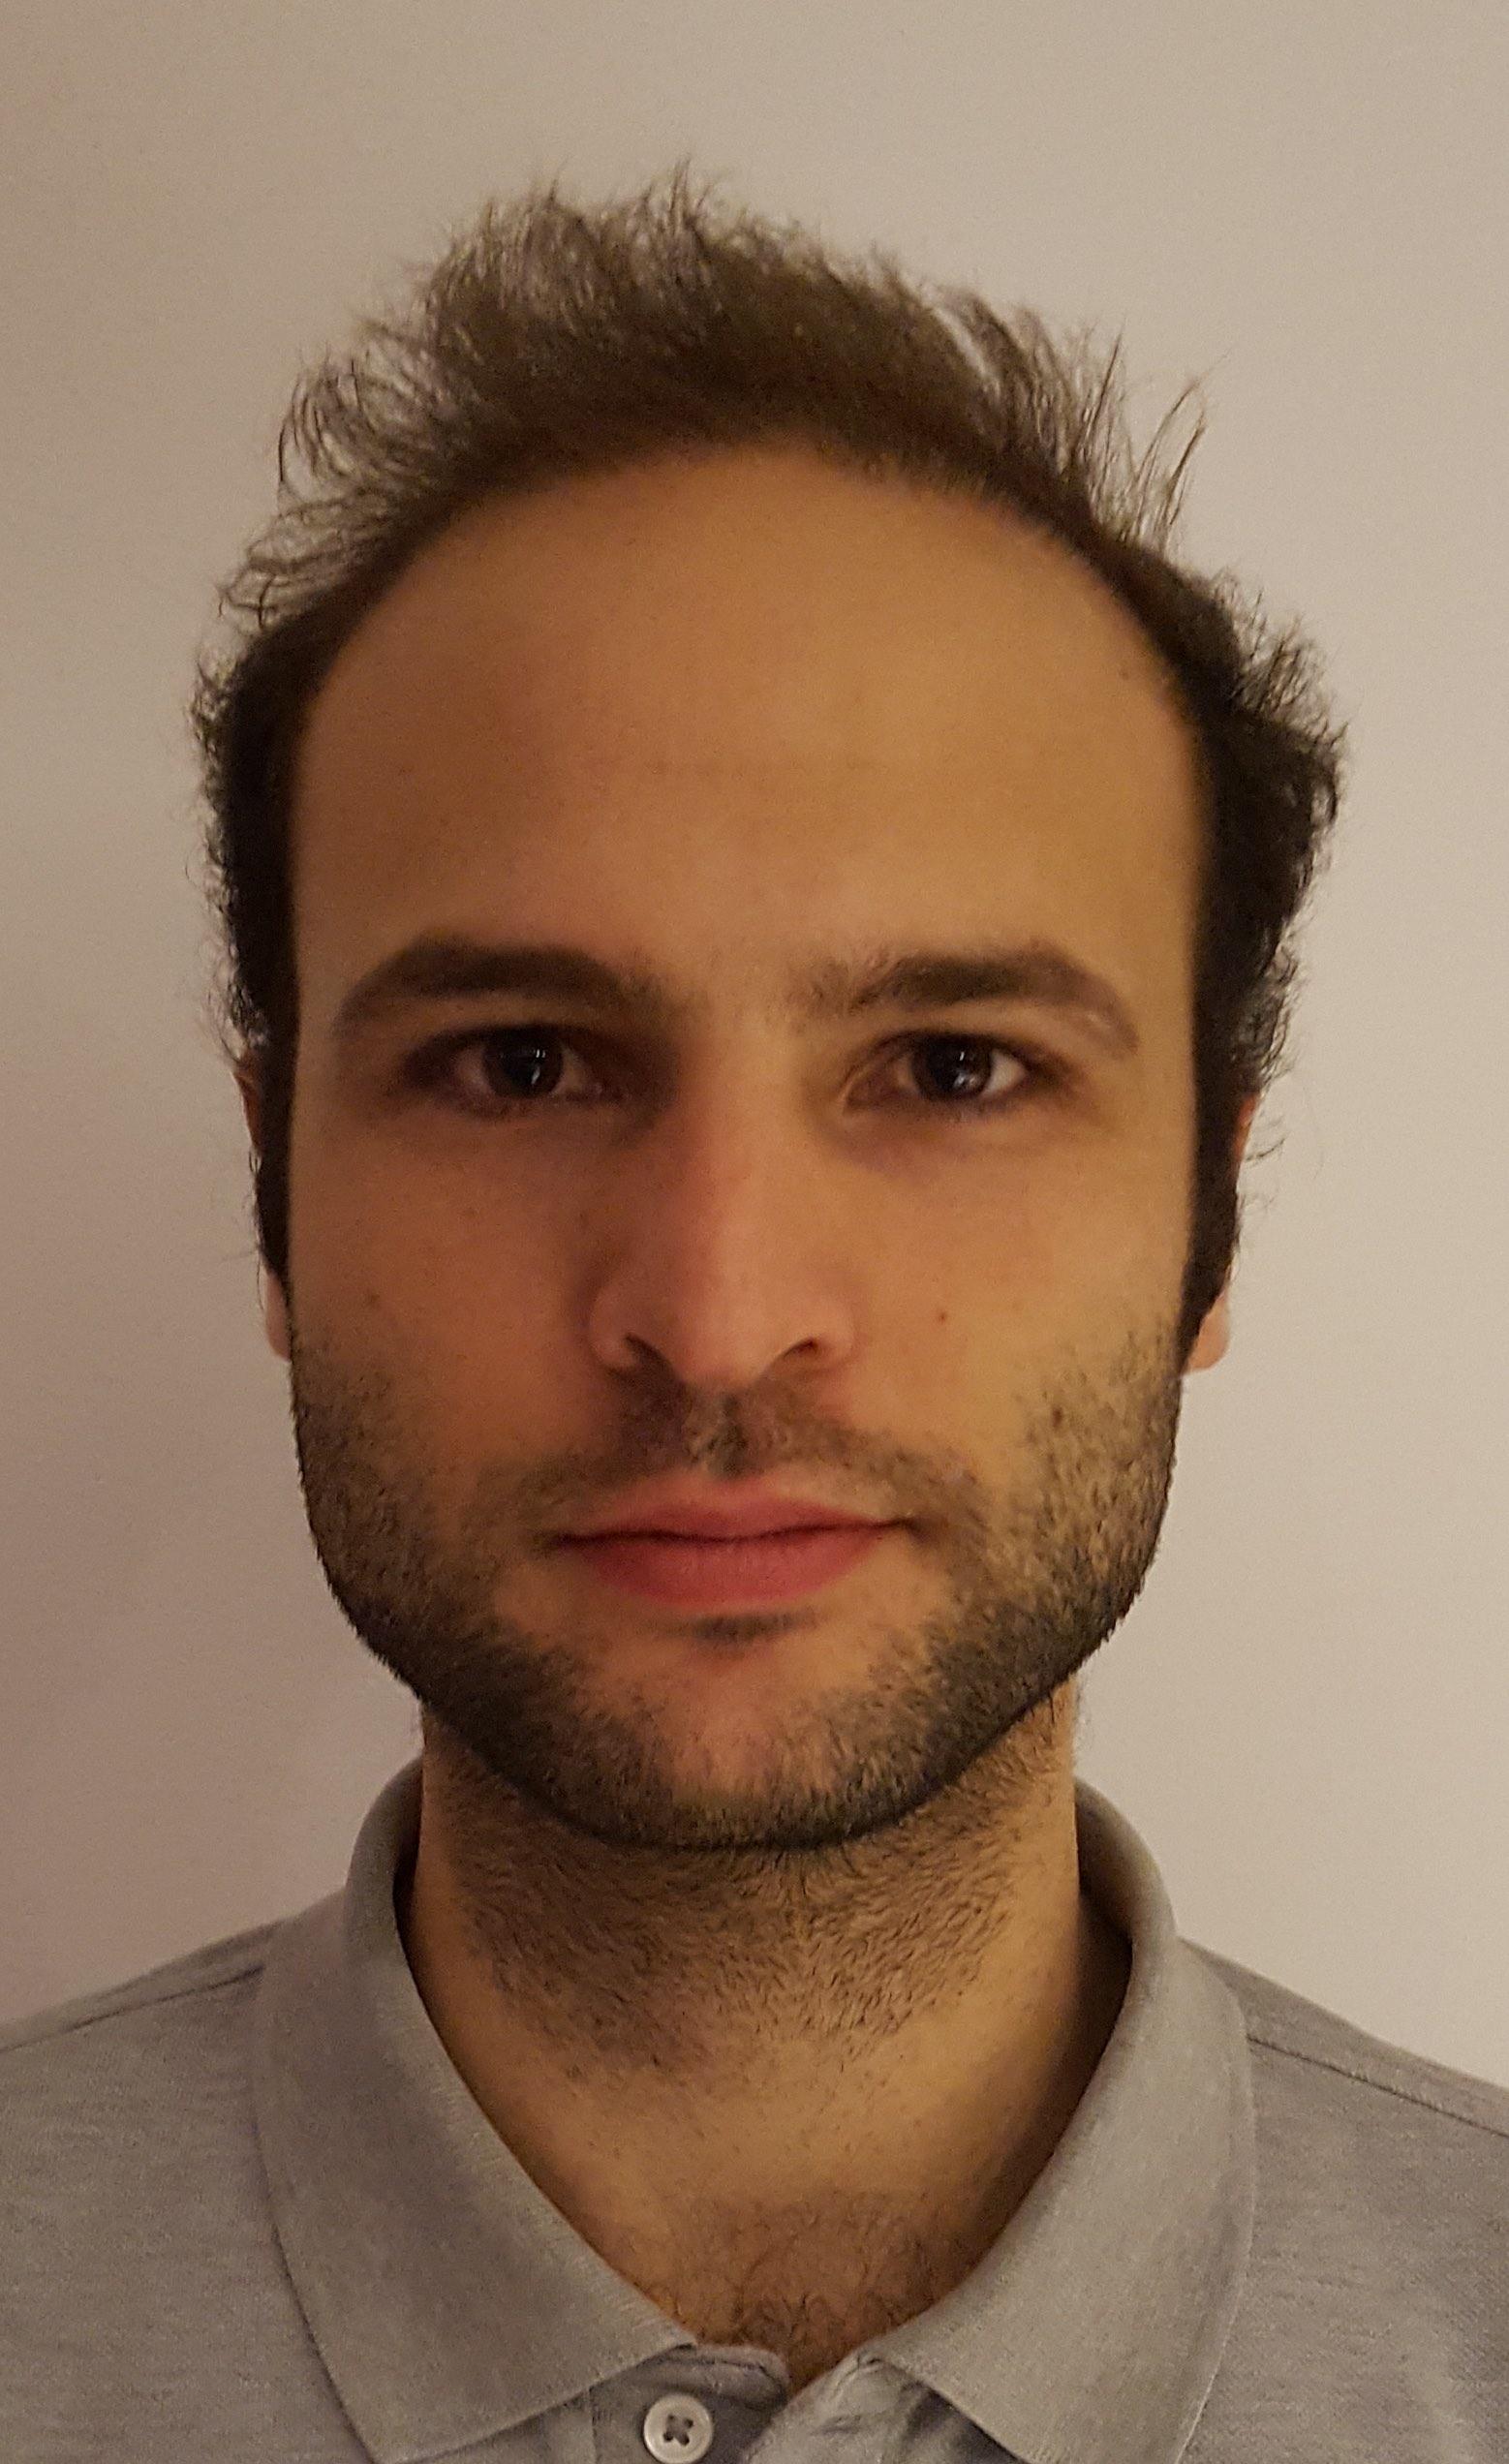 Maxime Nicolas Mivelaz